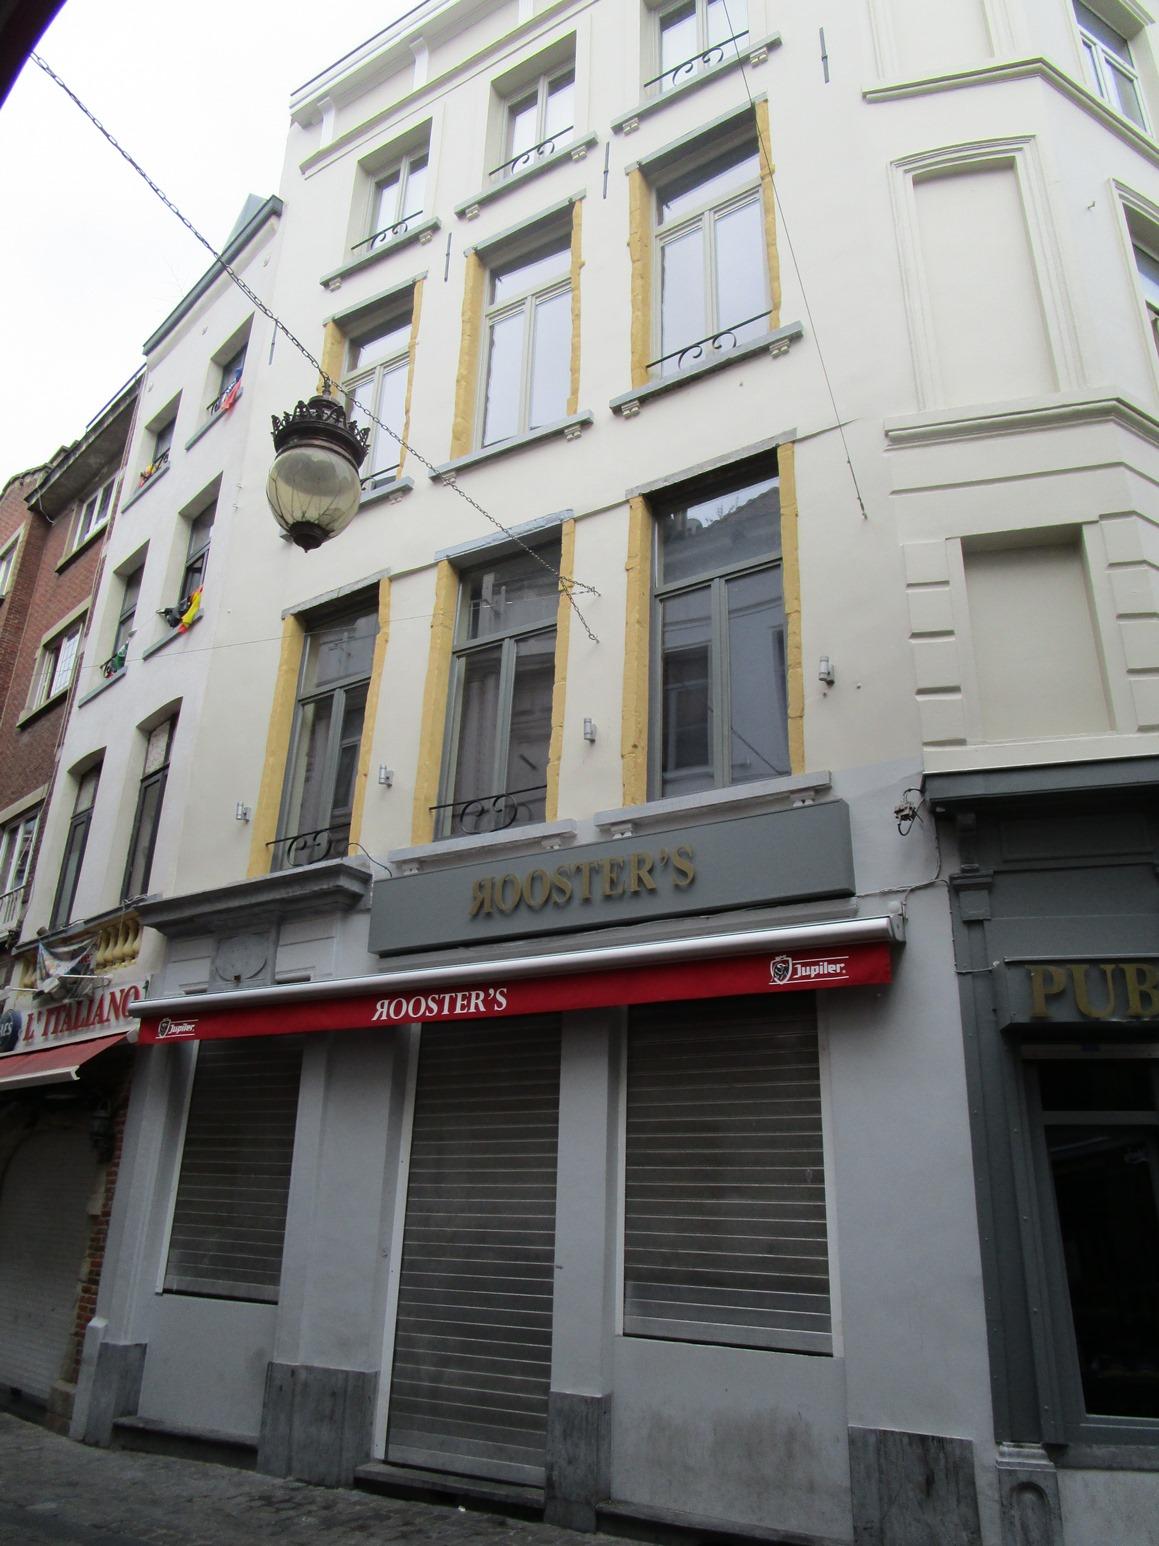 Greepstraat 30, 2015